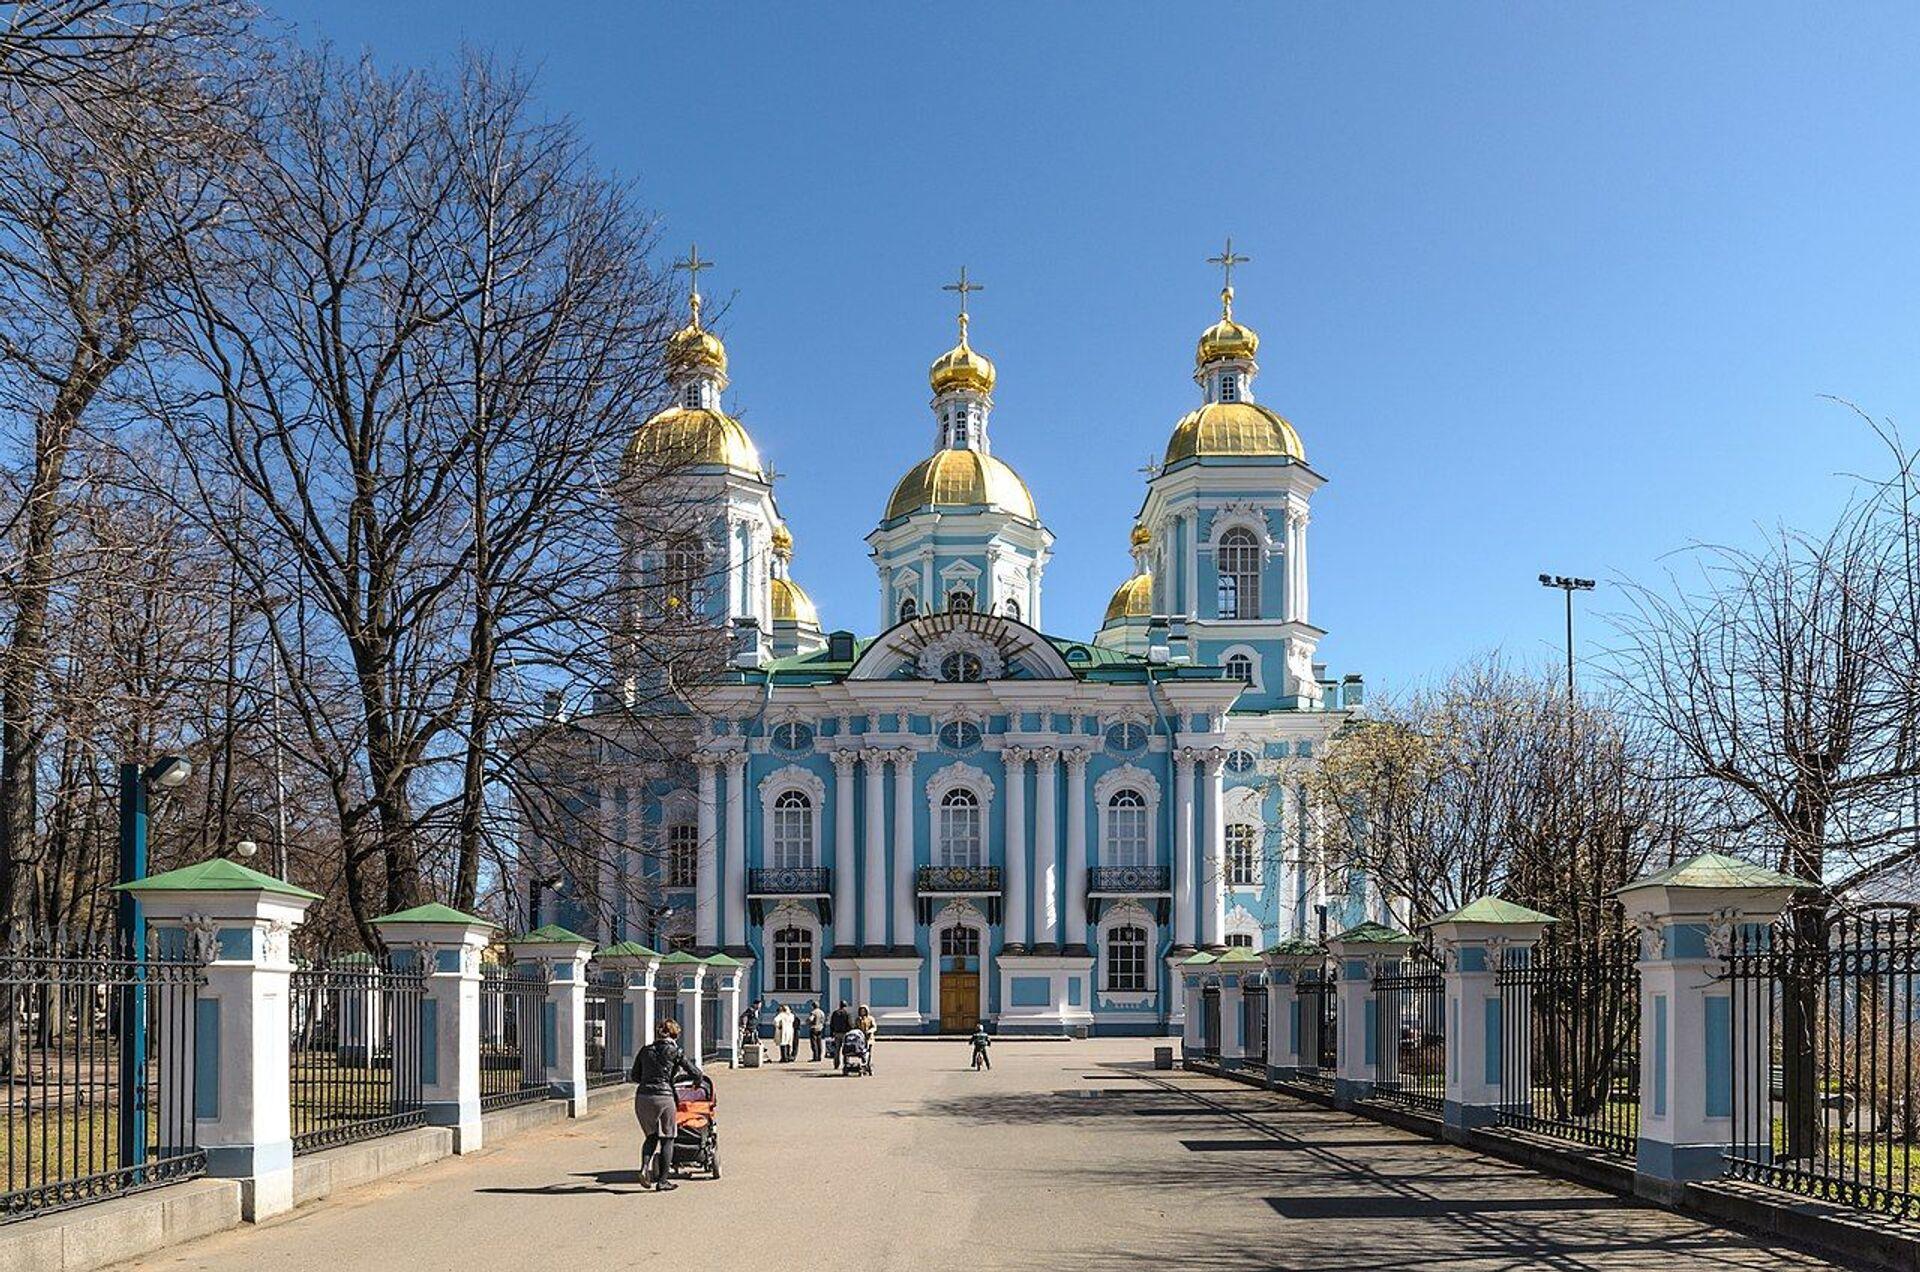 Никољски морски сабор, Санкт Петербург, Русија - Sputnik Србија, 1920, 13.07.2021